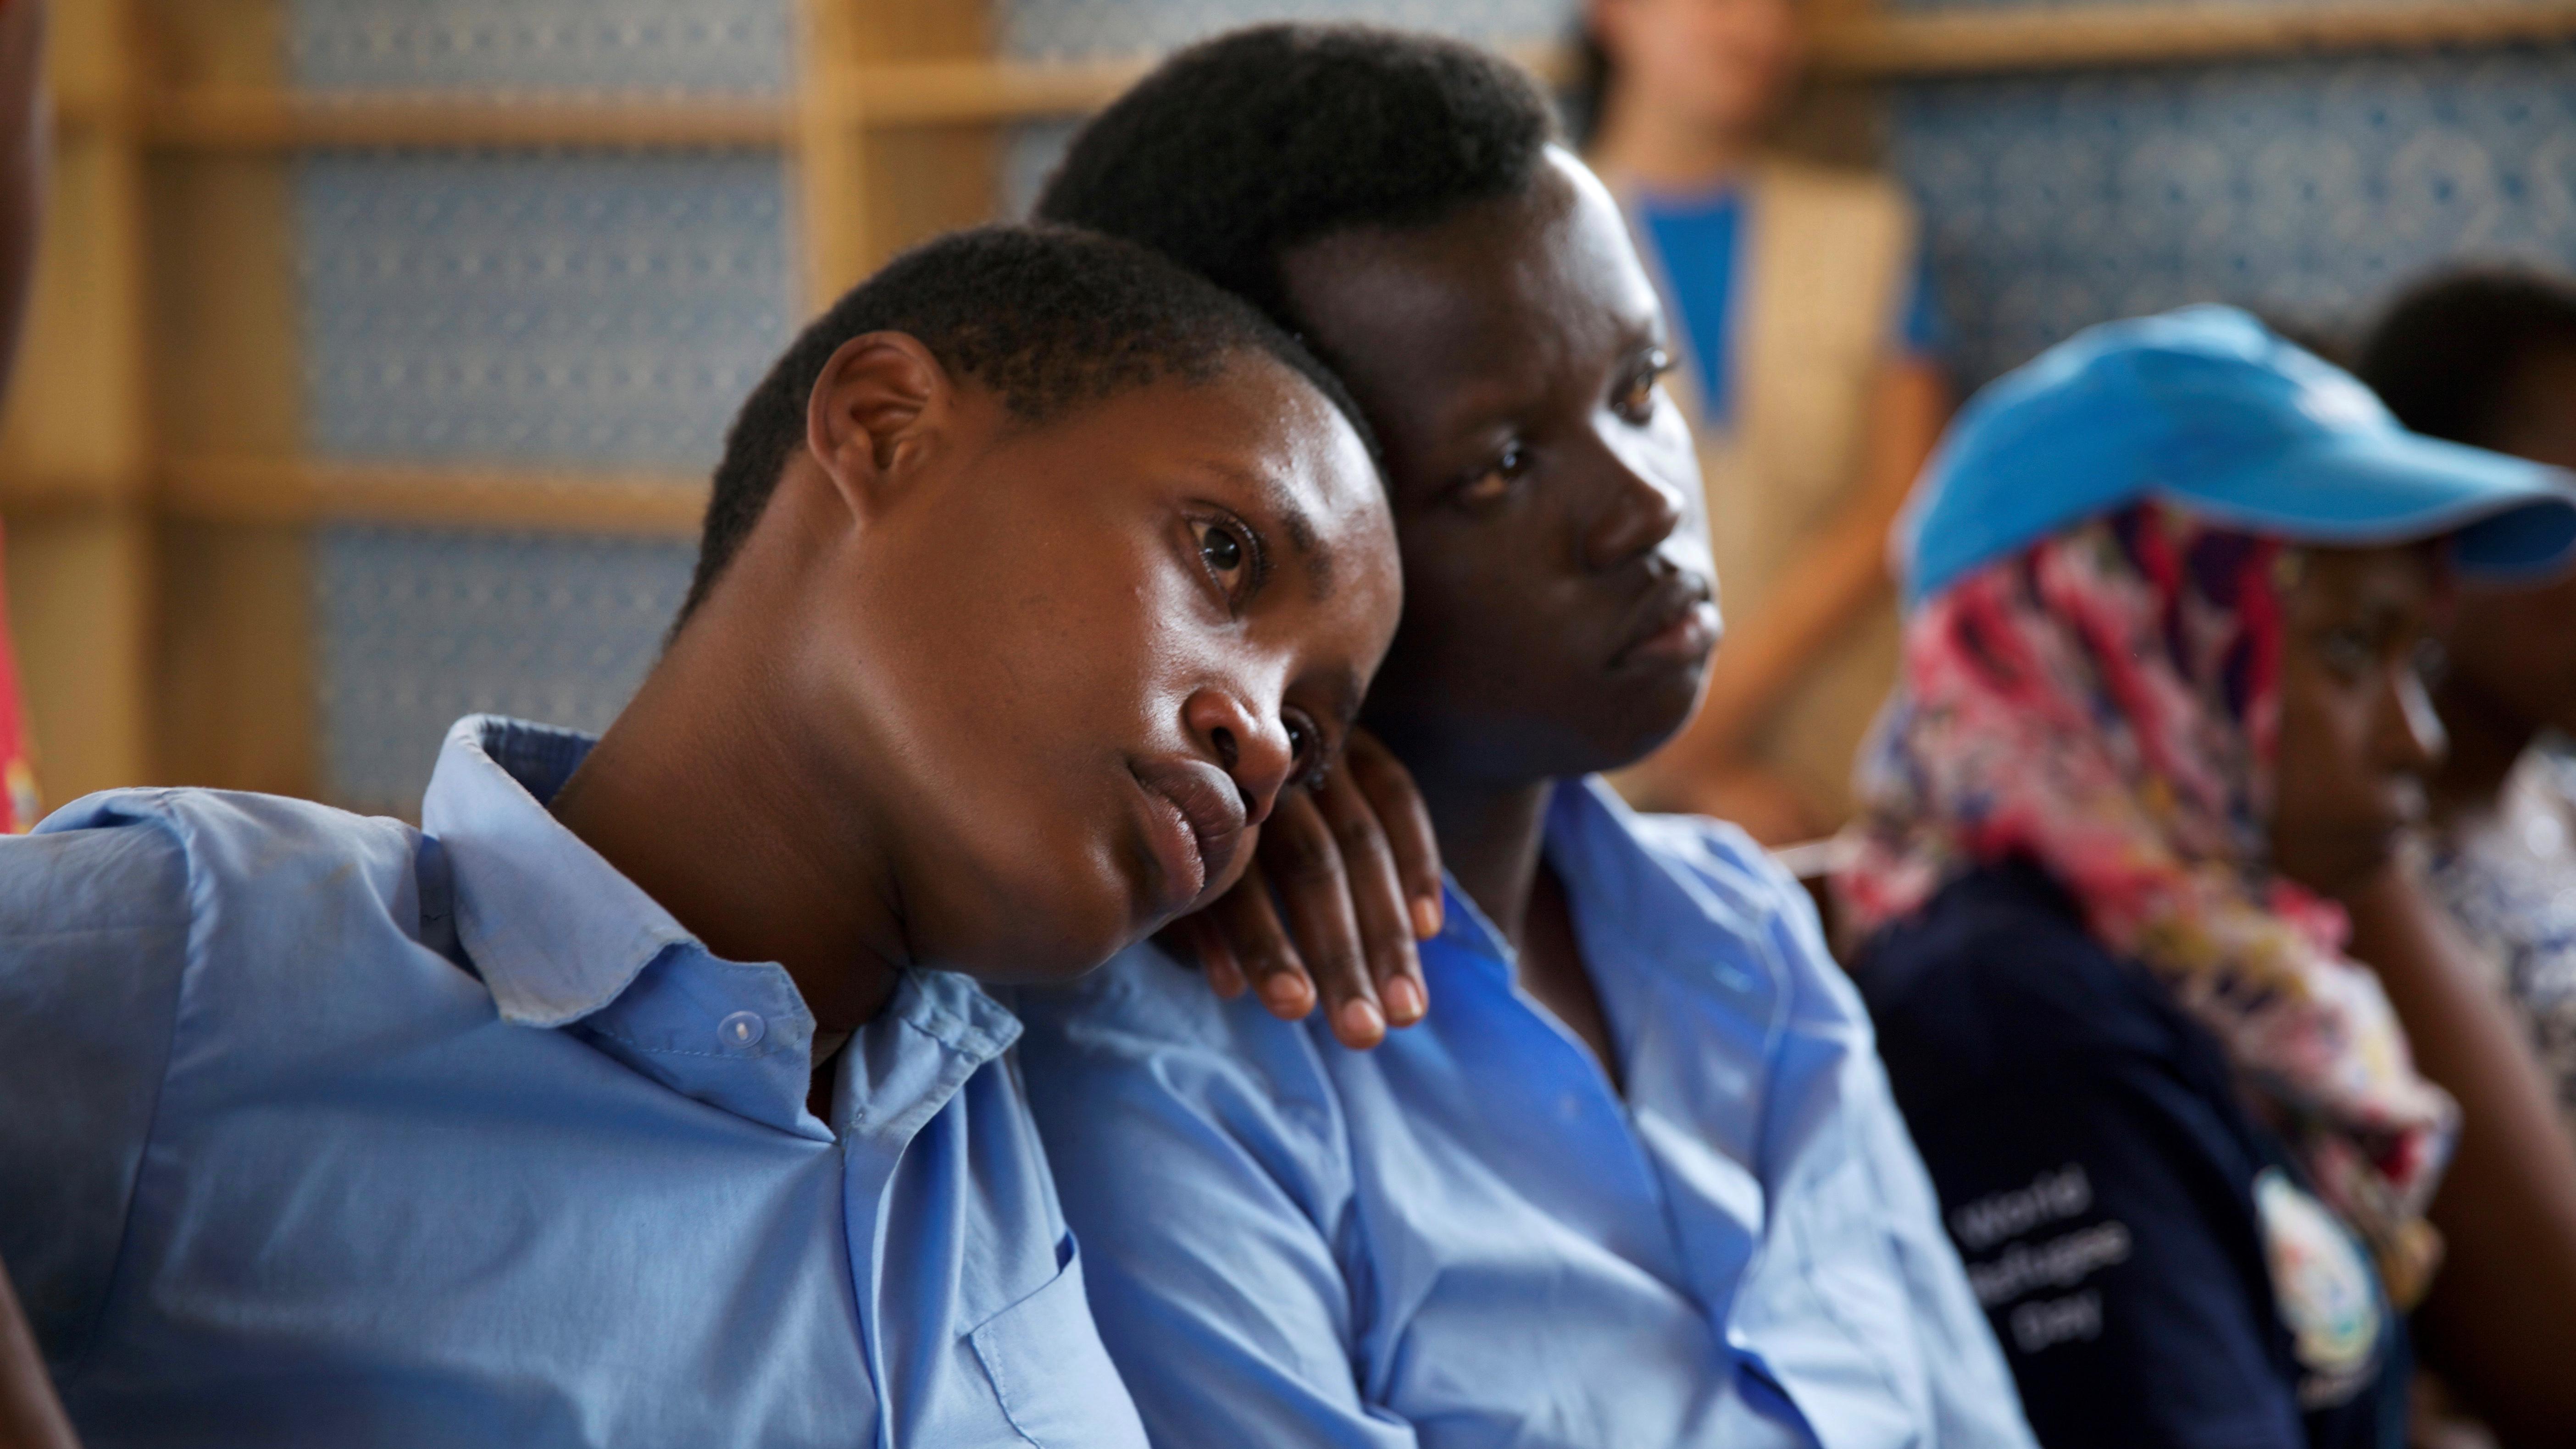 Burundian refugee school girls listen to Pakistani Nobel Peace Prize laureate Malala Yousafzai at the Mahama refugee camp, Rwanda, July 14, 2016. Picture taken July 14, 2016. REUTERS/Katy Migiro - S1AETPSGAHAB